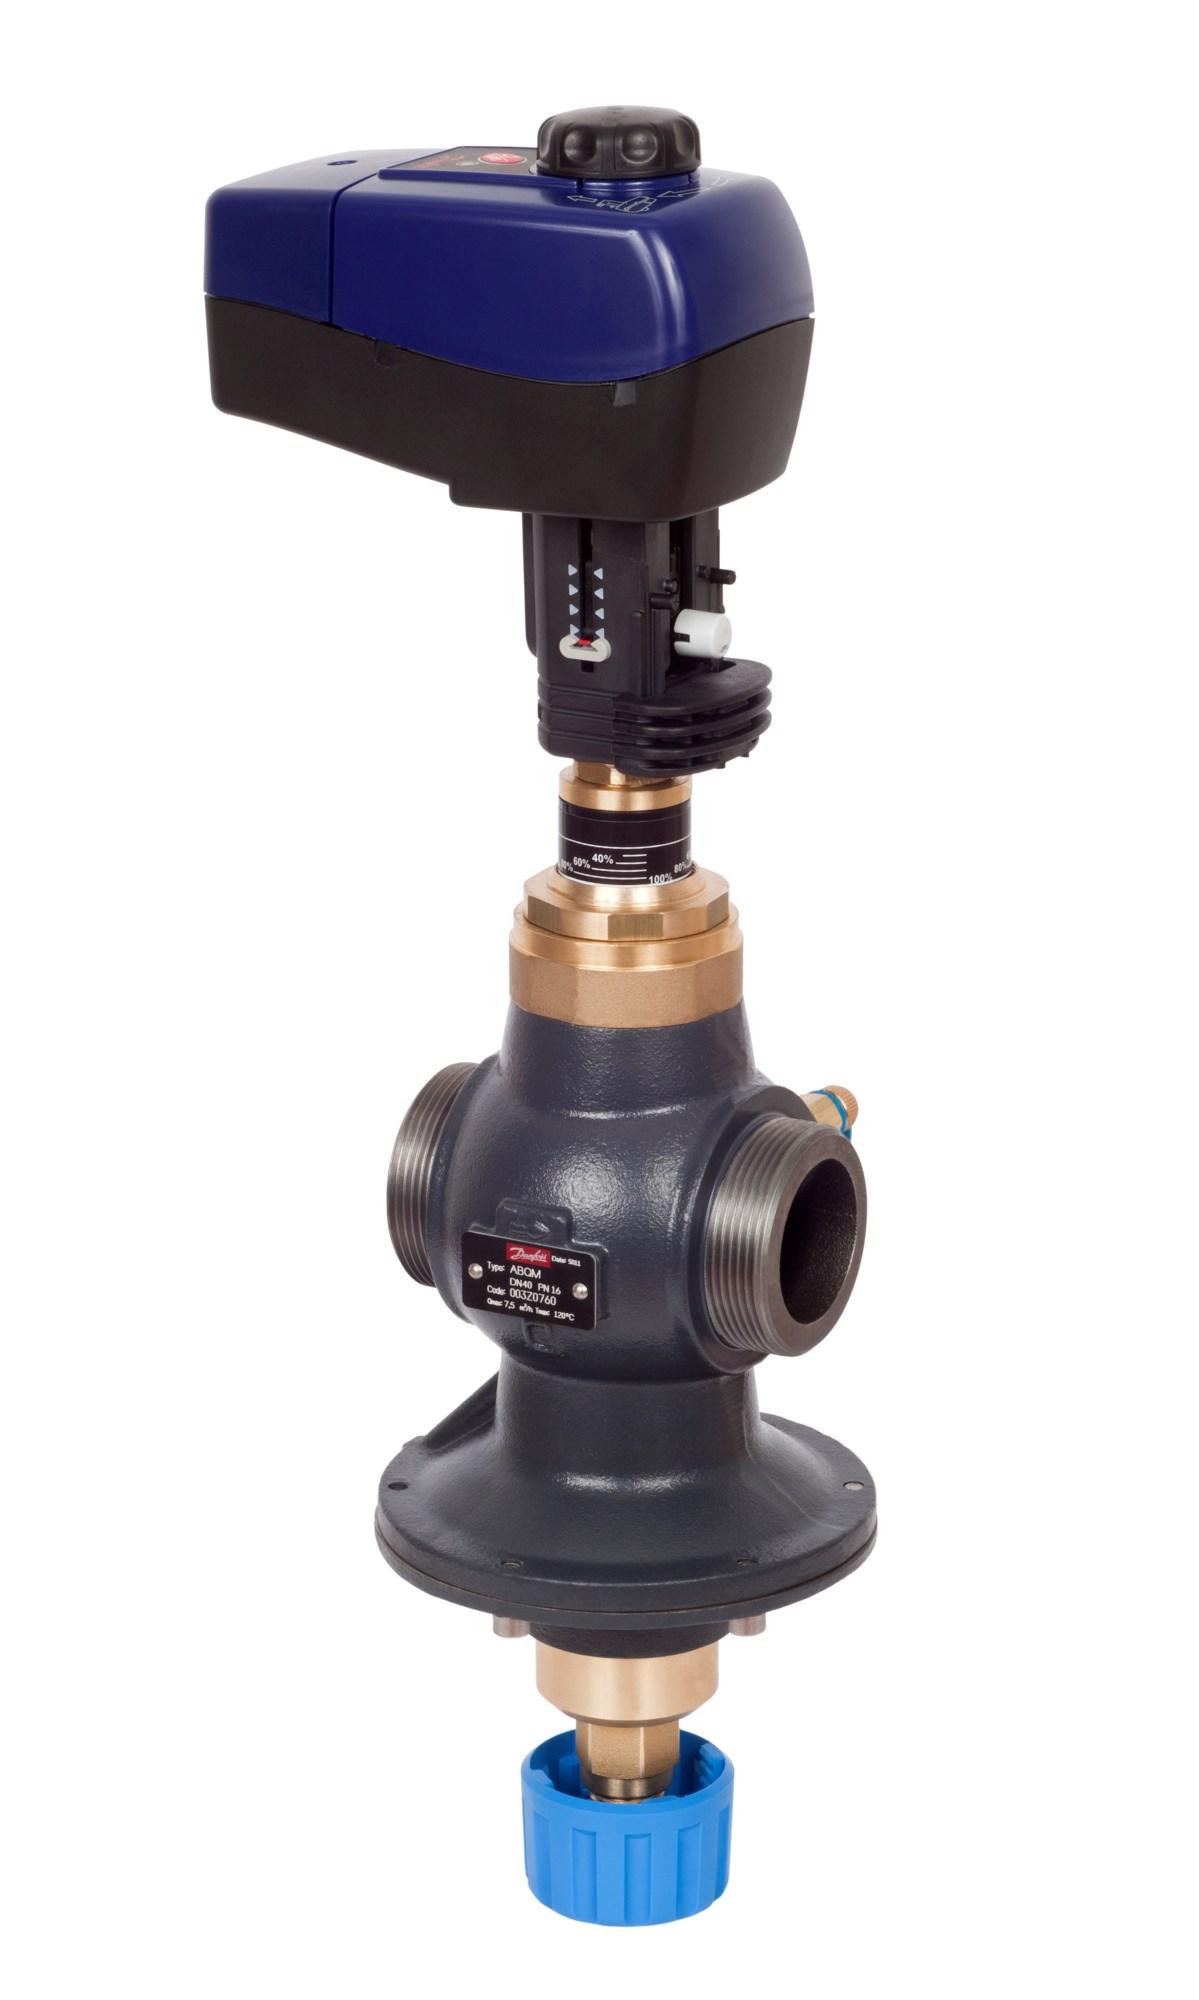 Danfoss 065z7547-isolierzwischenstück//calefacción regulador de control calefacción